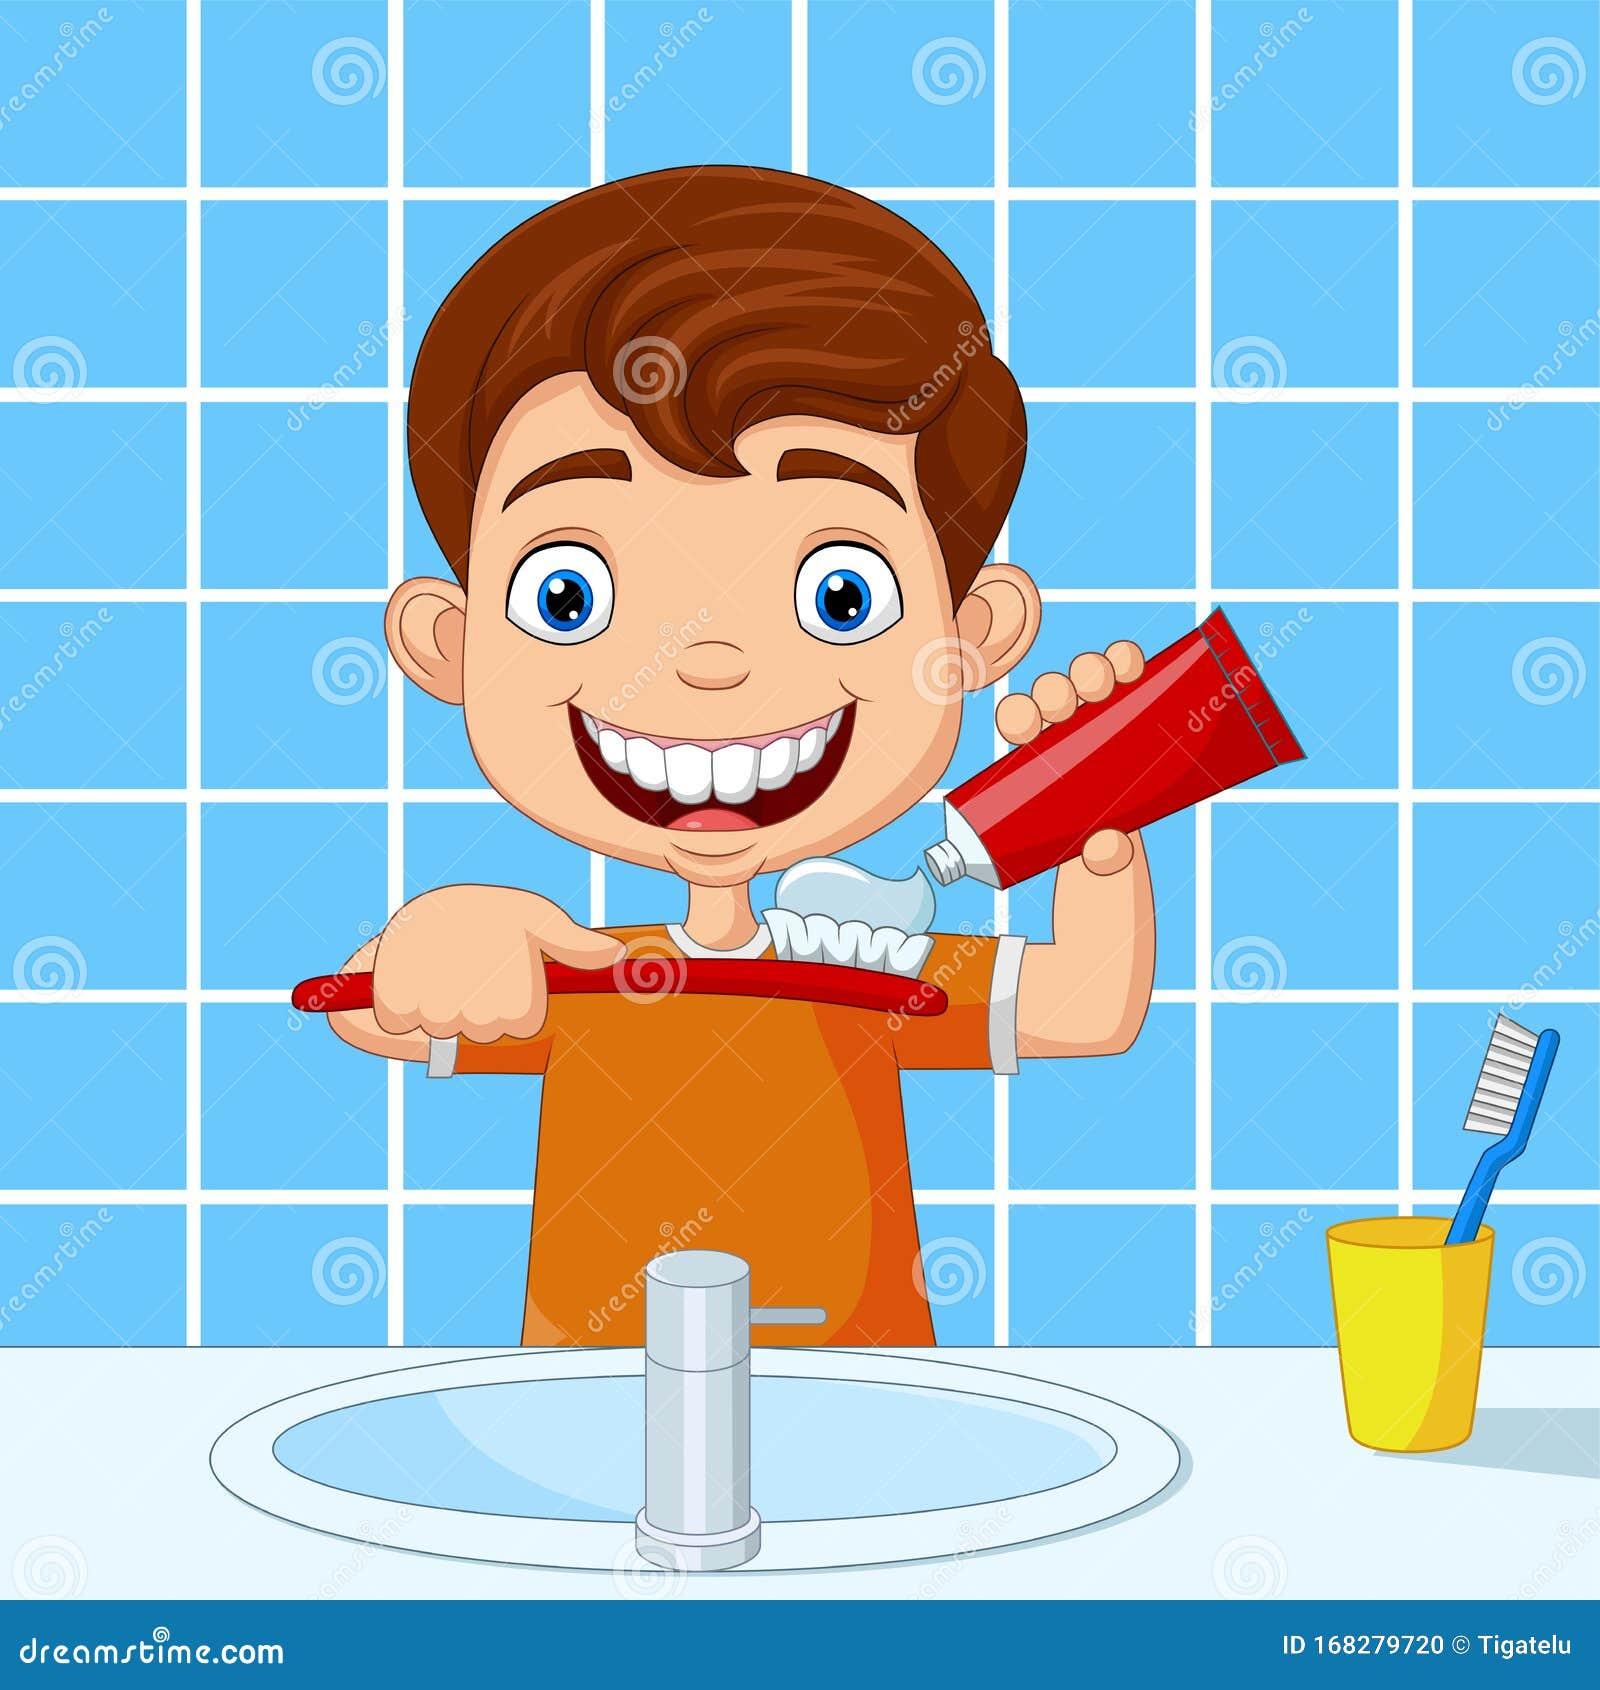 Cartoon boy having bath washing hair Royalty Free Vector